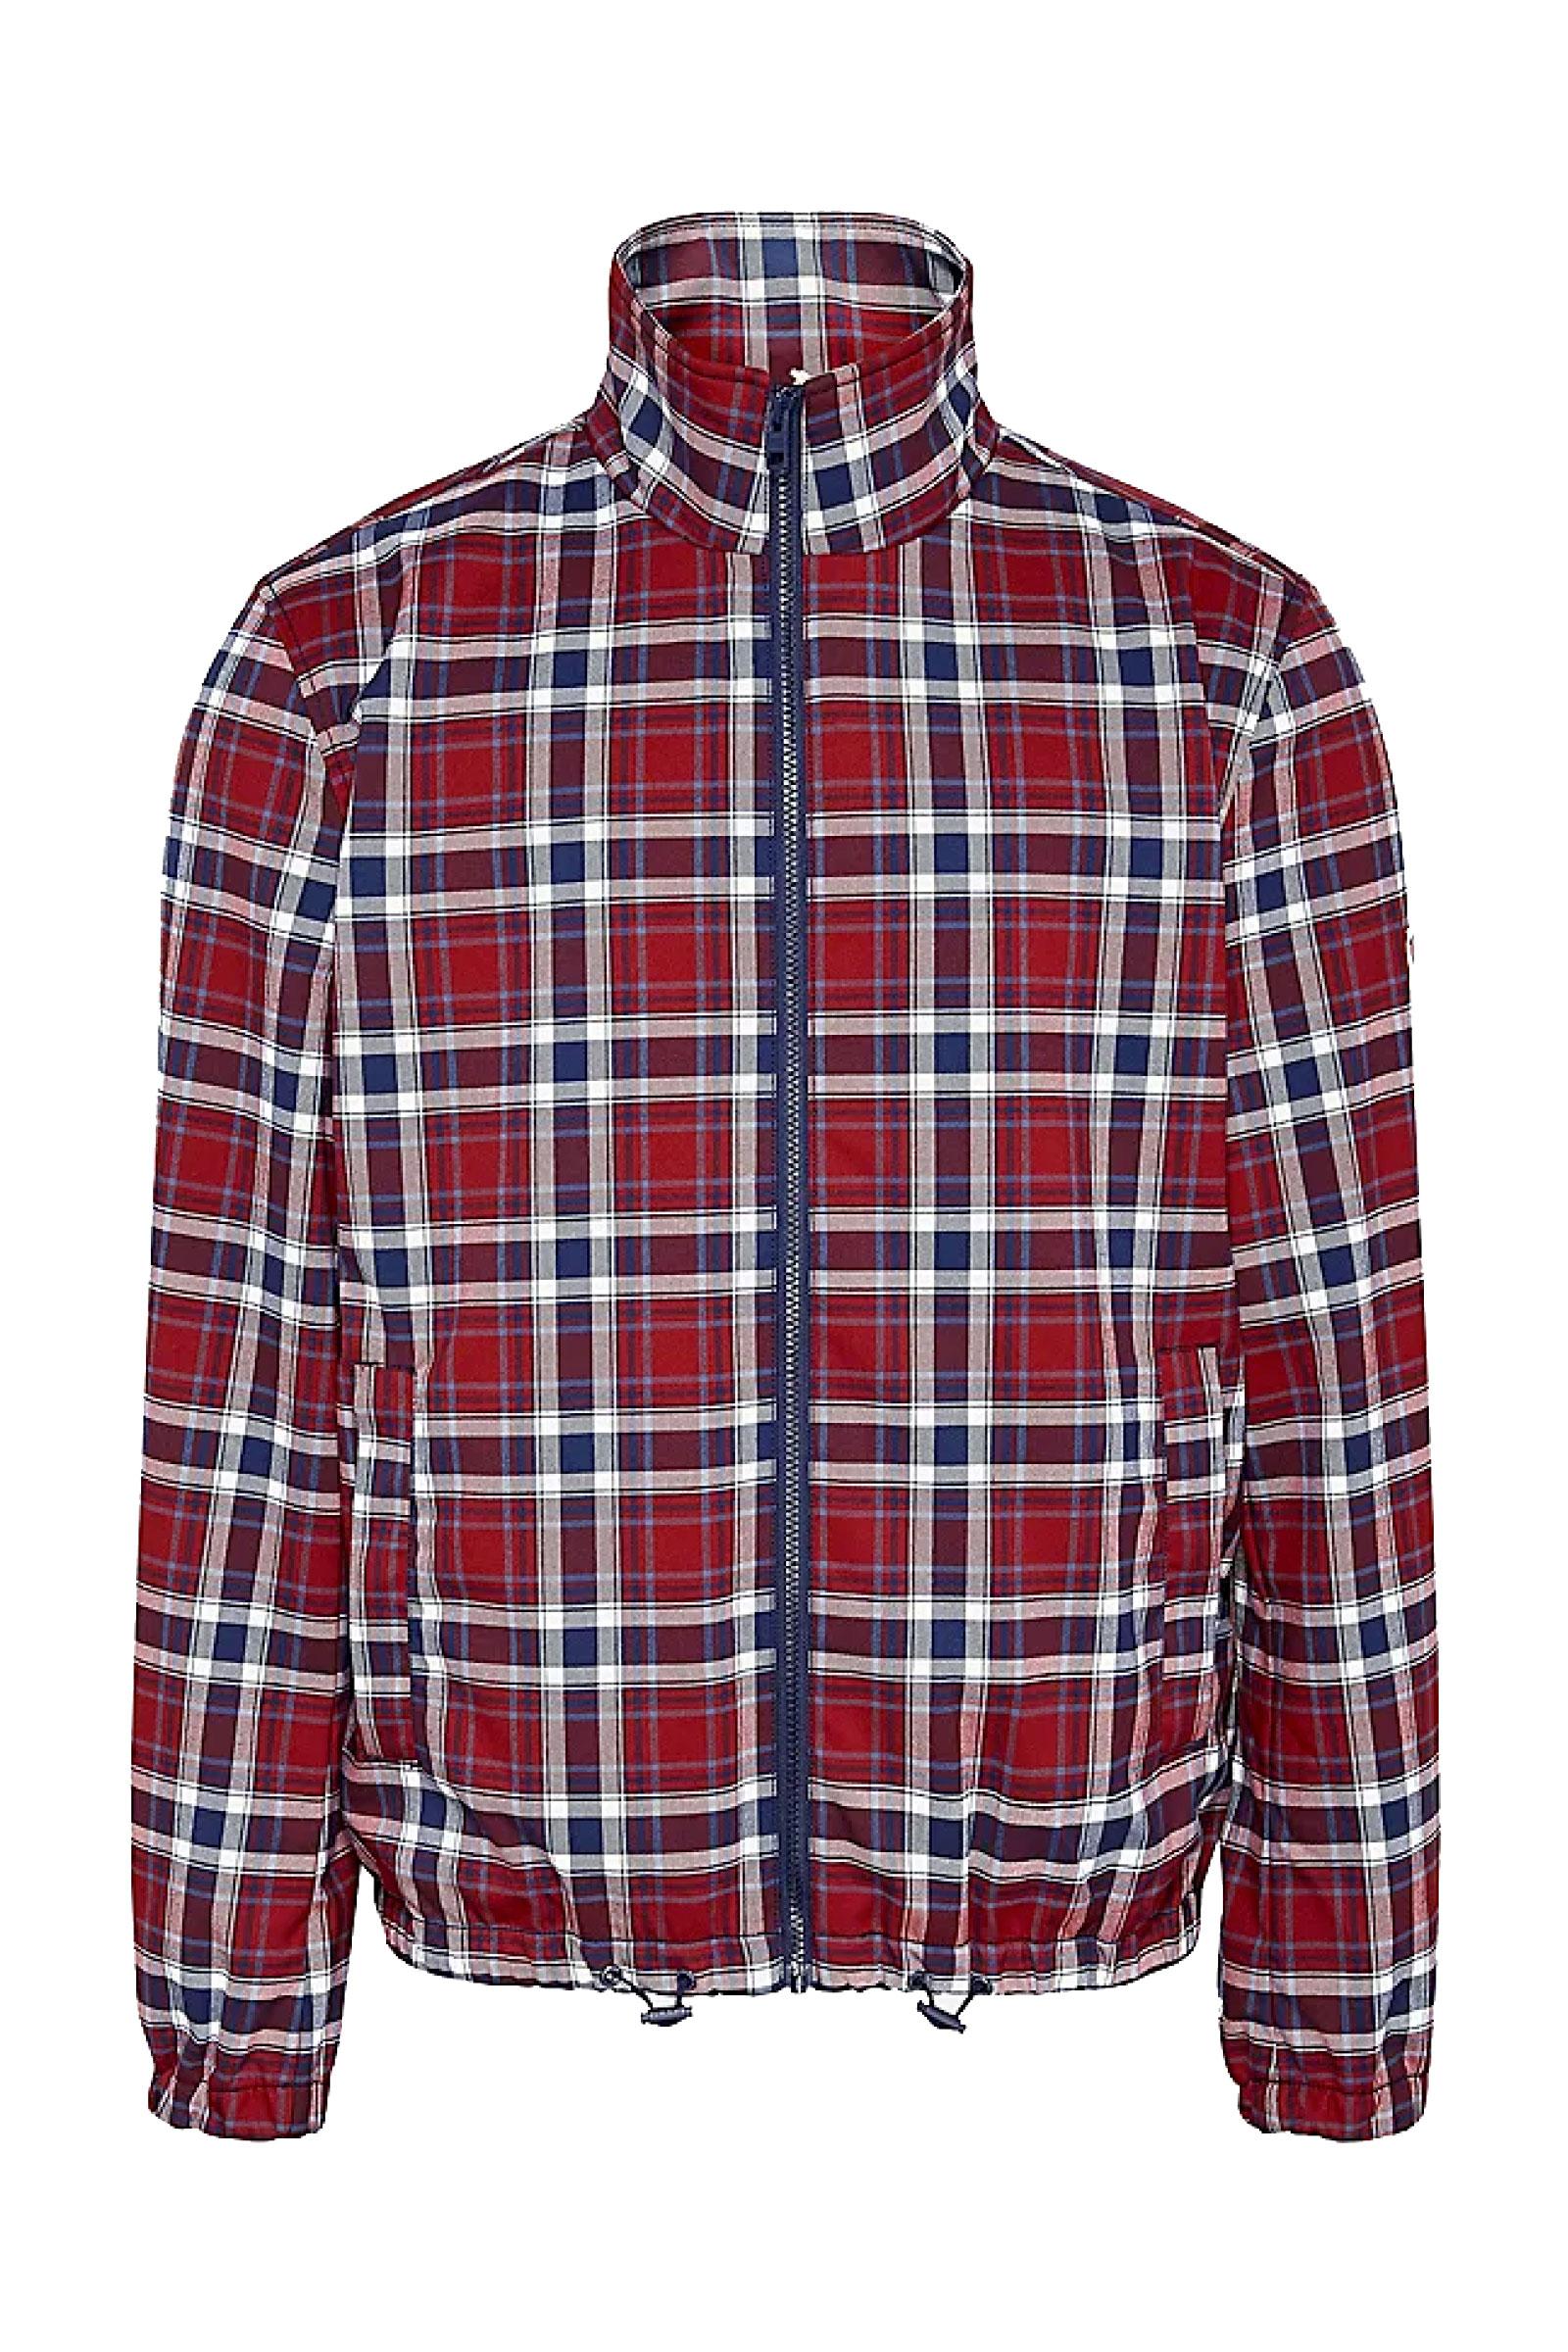 TOMMY JEANS Men's jacket TOMMY JEANS | Jacket | DM0DM08427XLK